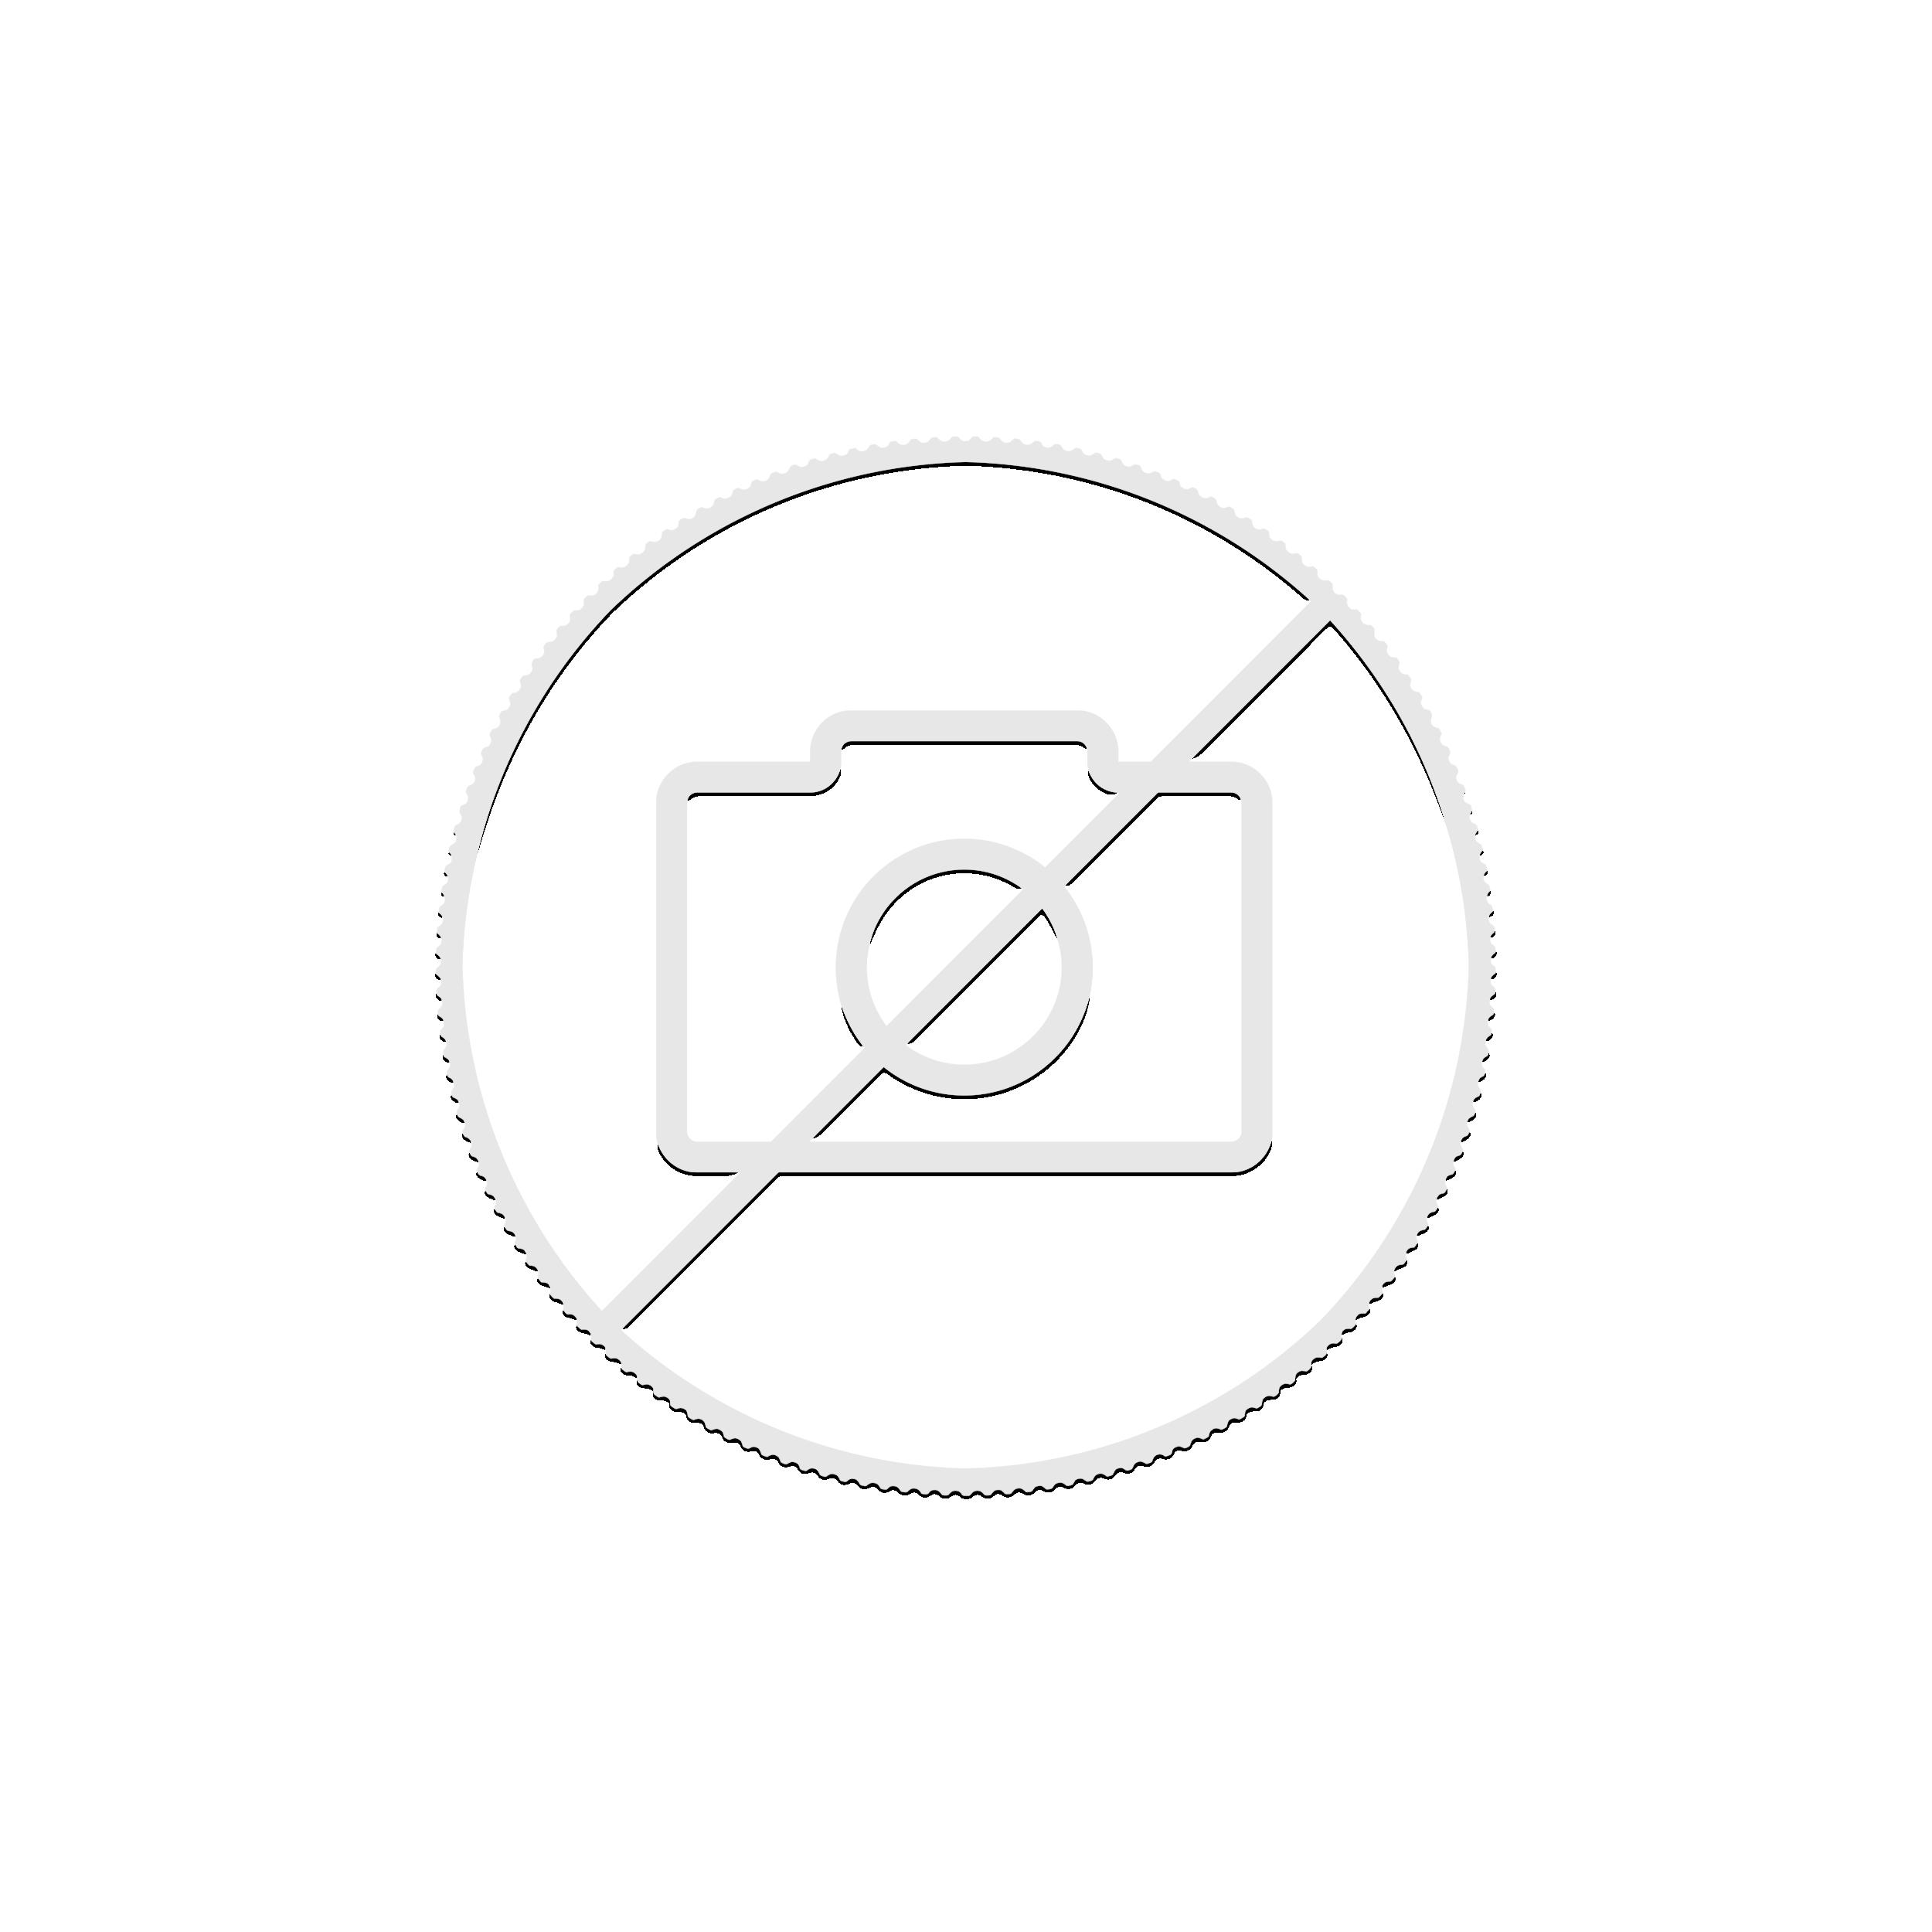 10-Delige set gouden baren Pamp Suisse - Poolse koningen